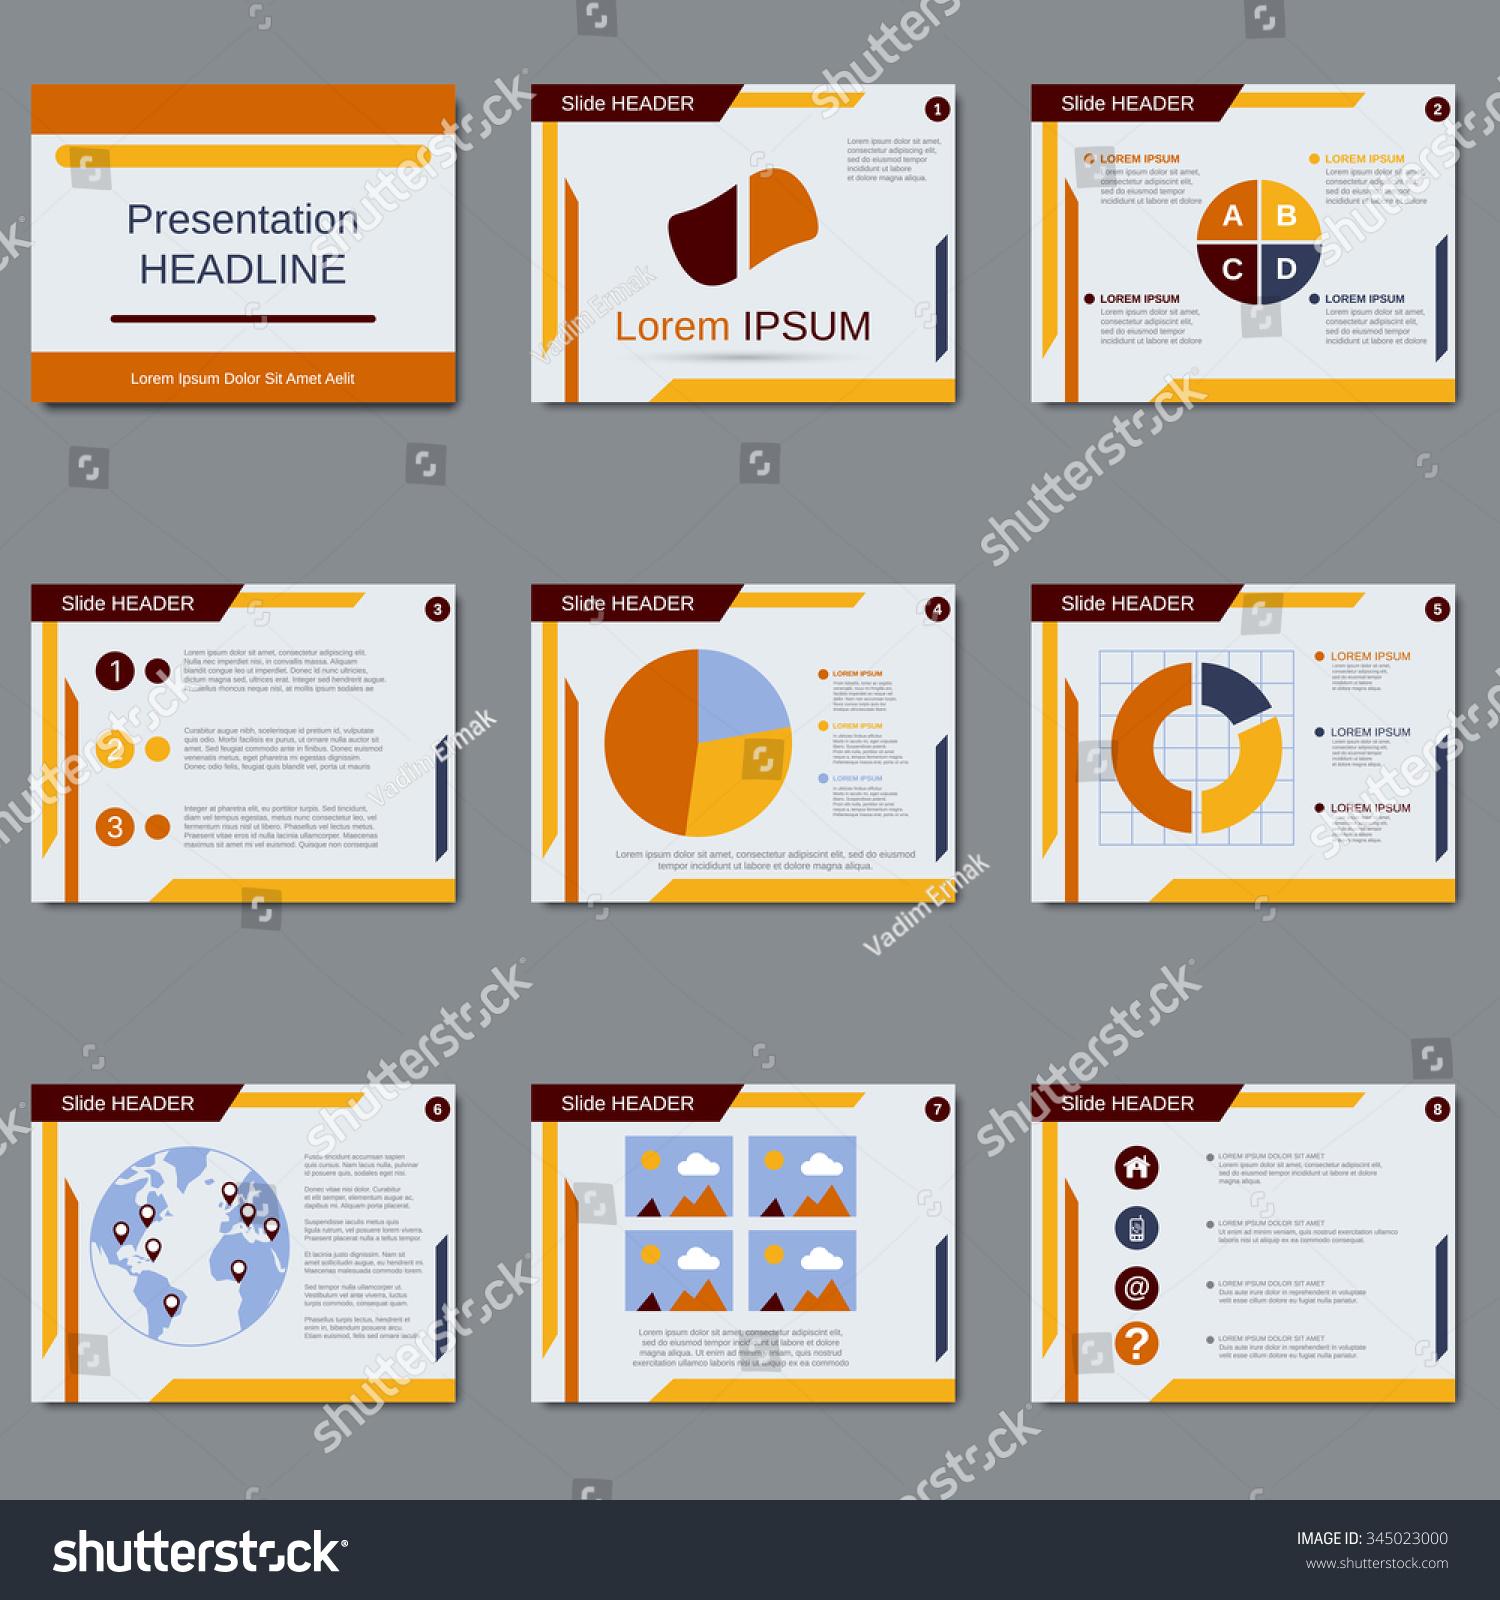 Presentation Layout Design – wolfcoin.net